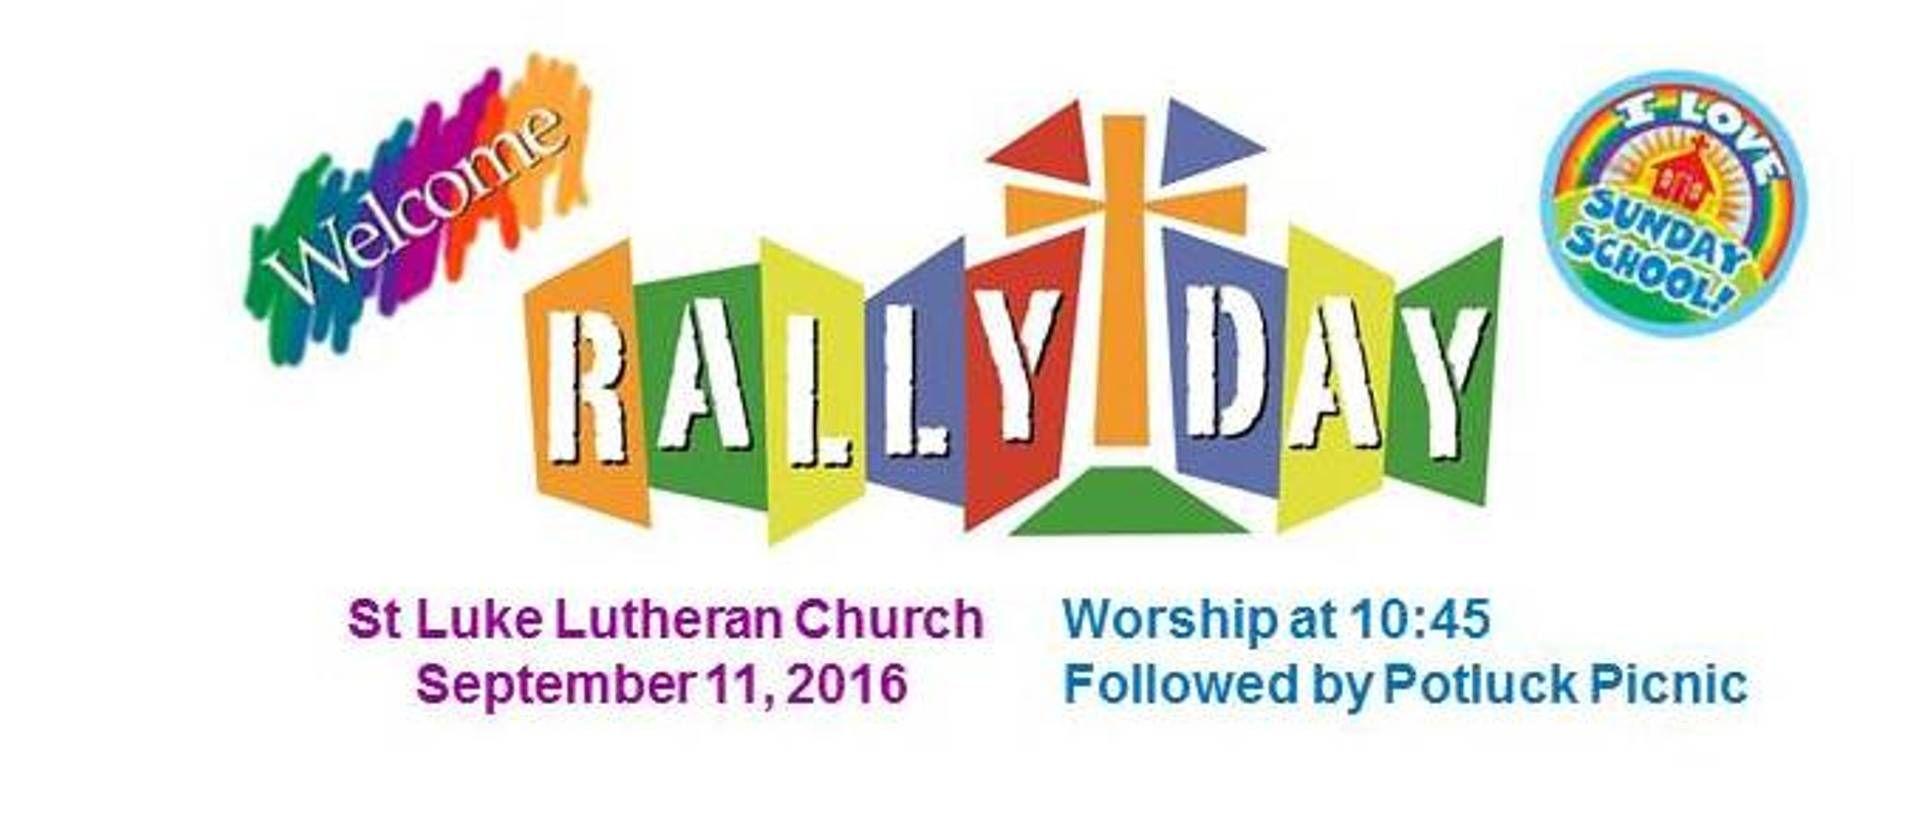 St. Luke Lutheran Church & Early Childhood Center